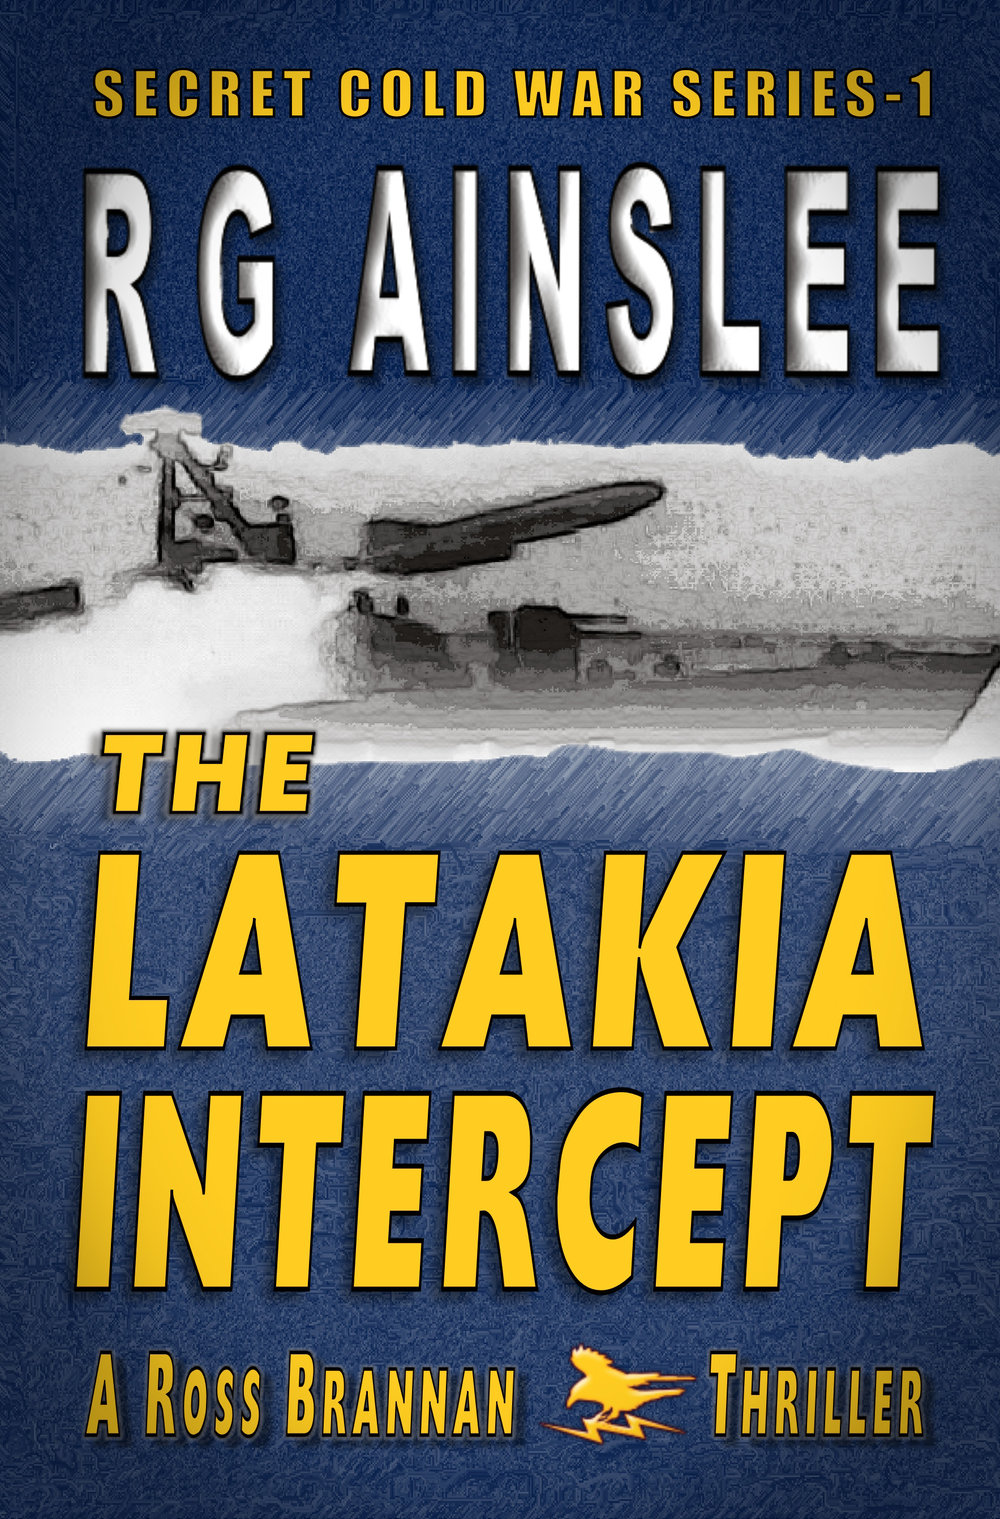 Latakia Intercept Cover 2018.jpg